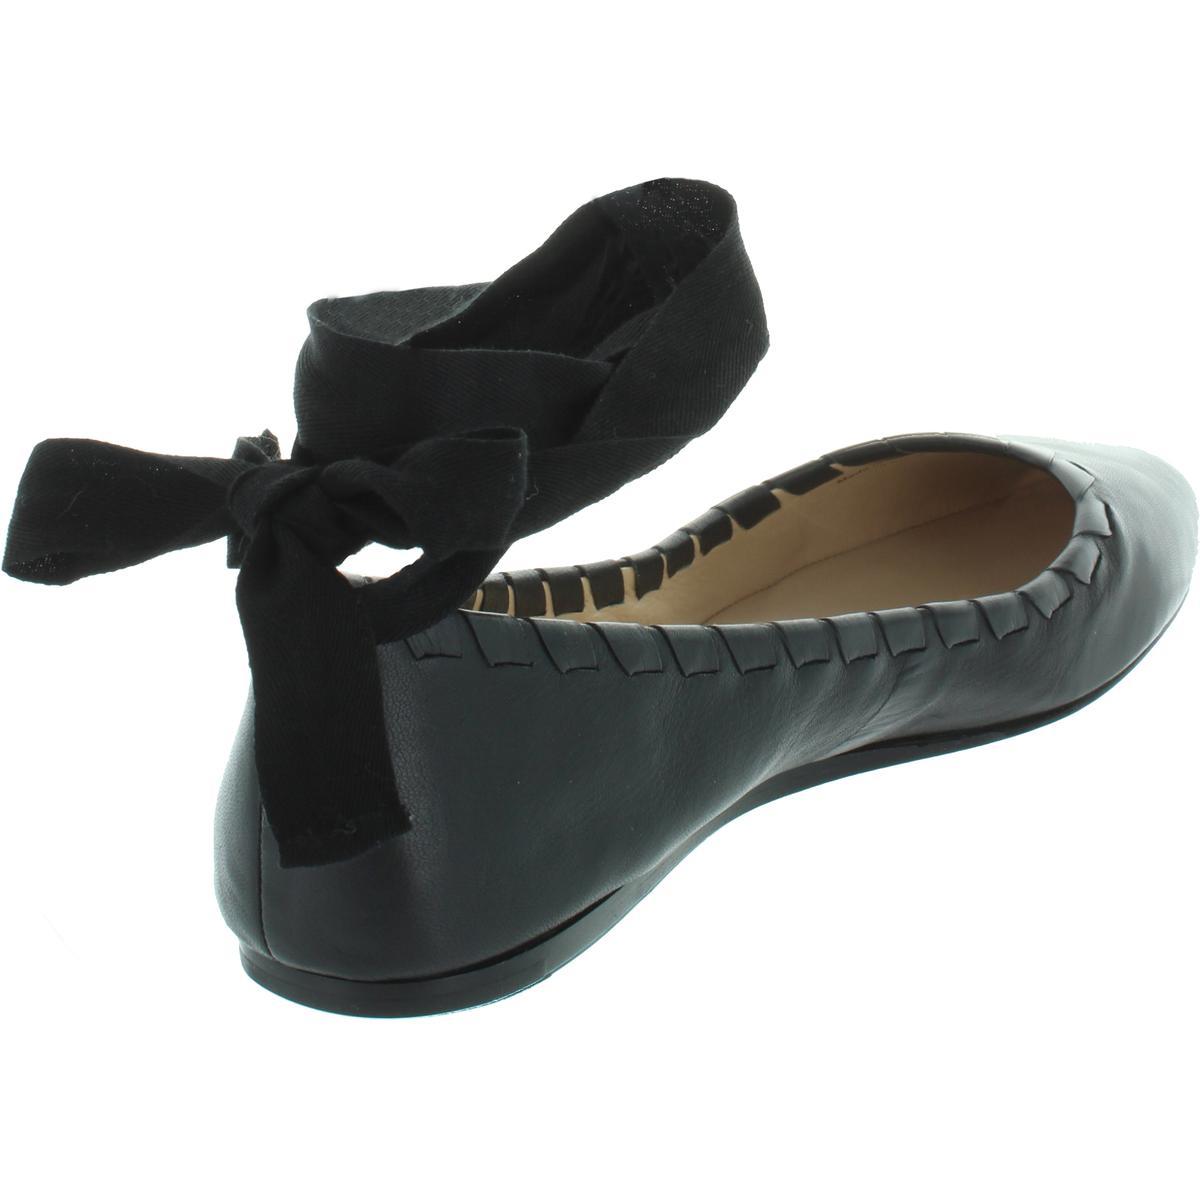 Via-Spiga-Womens-Baylie-Leather-Round-Toe-Ballet-Flats-Shoes-BHFO-6888 thumbnail 4